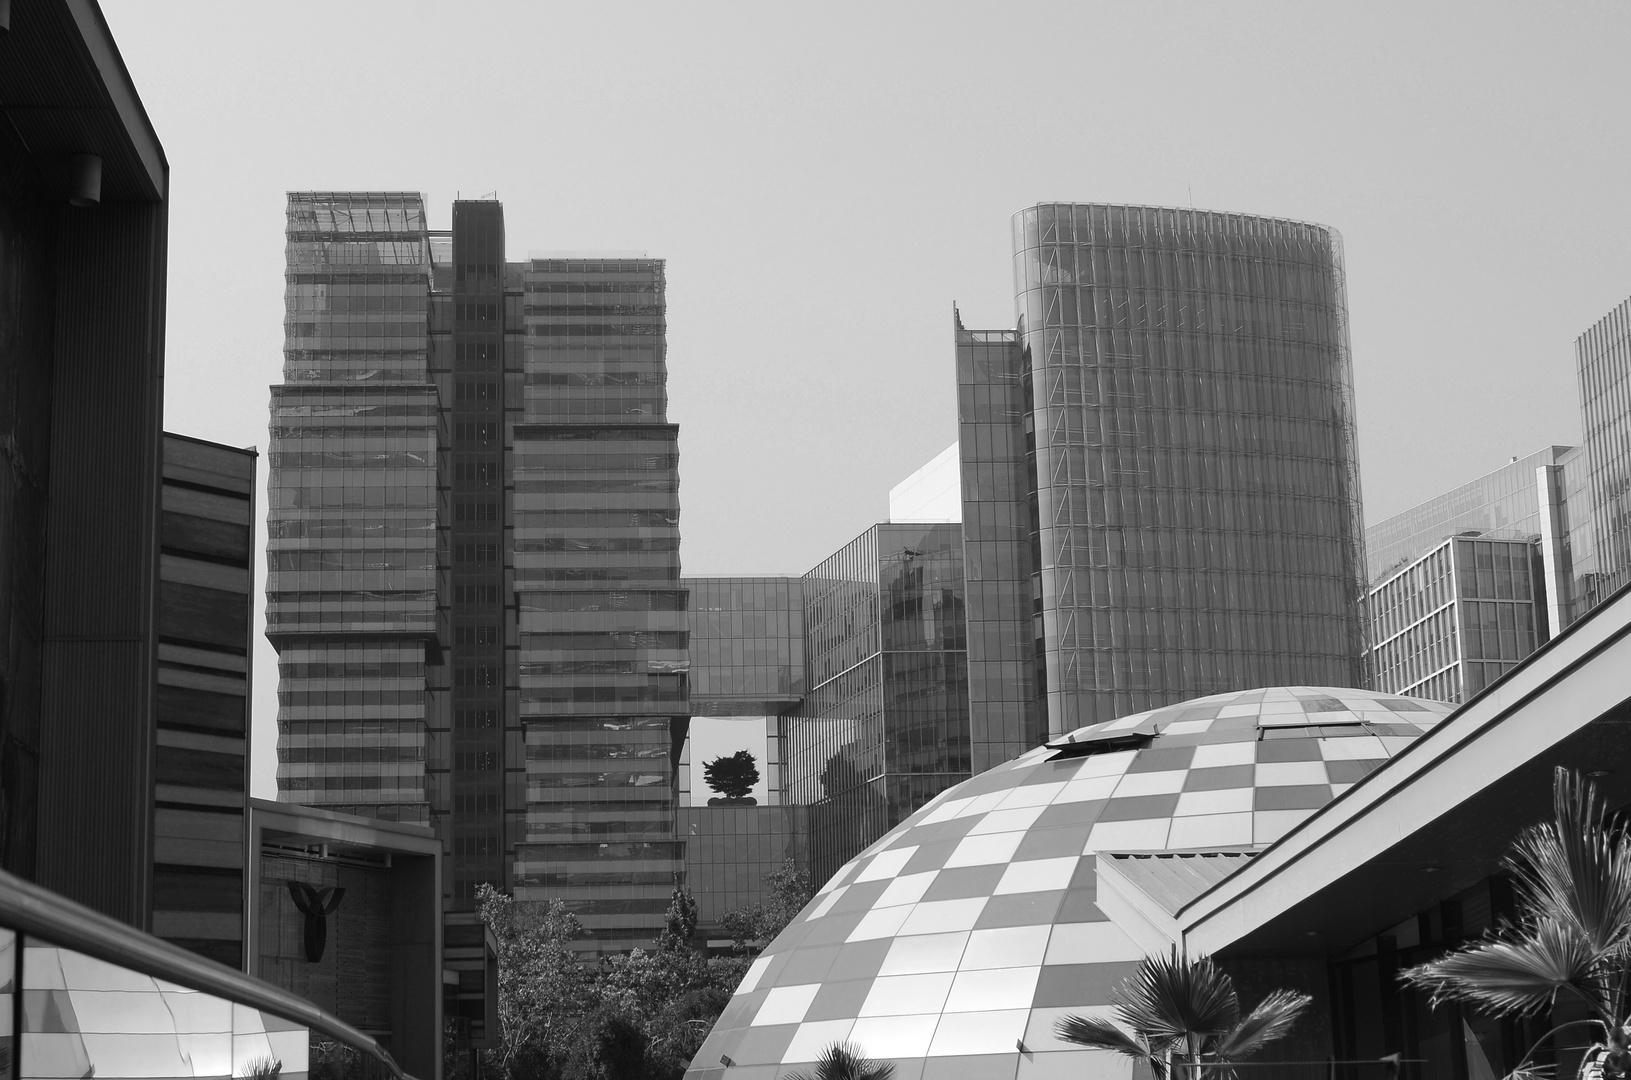 Presidente Riesco Street Buildings